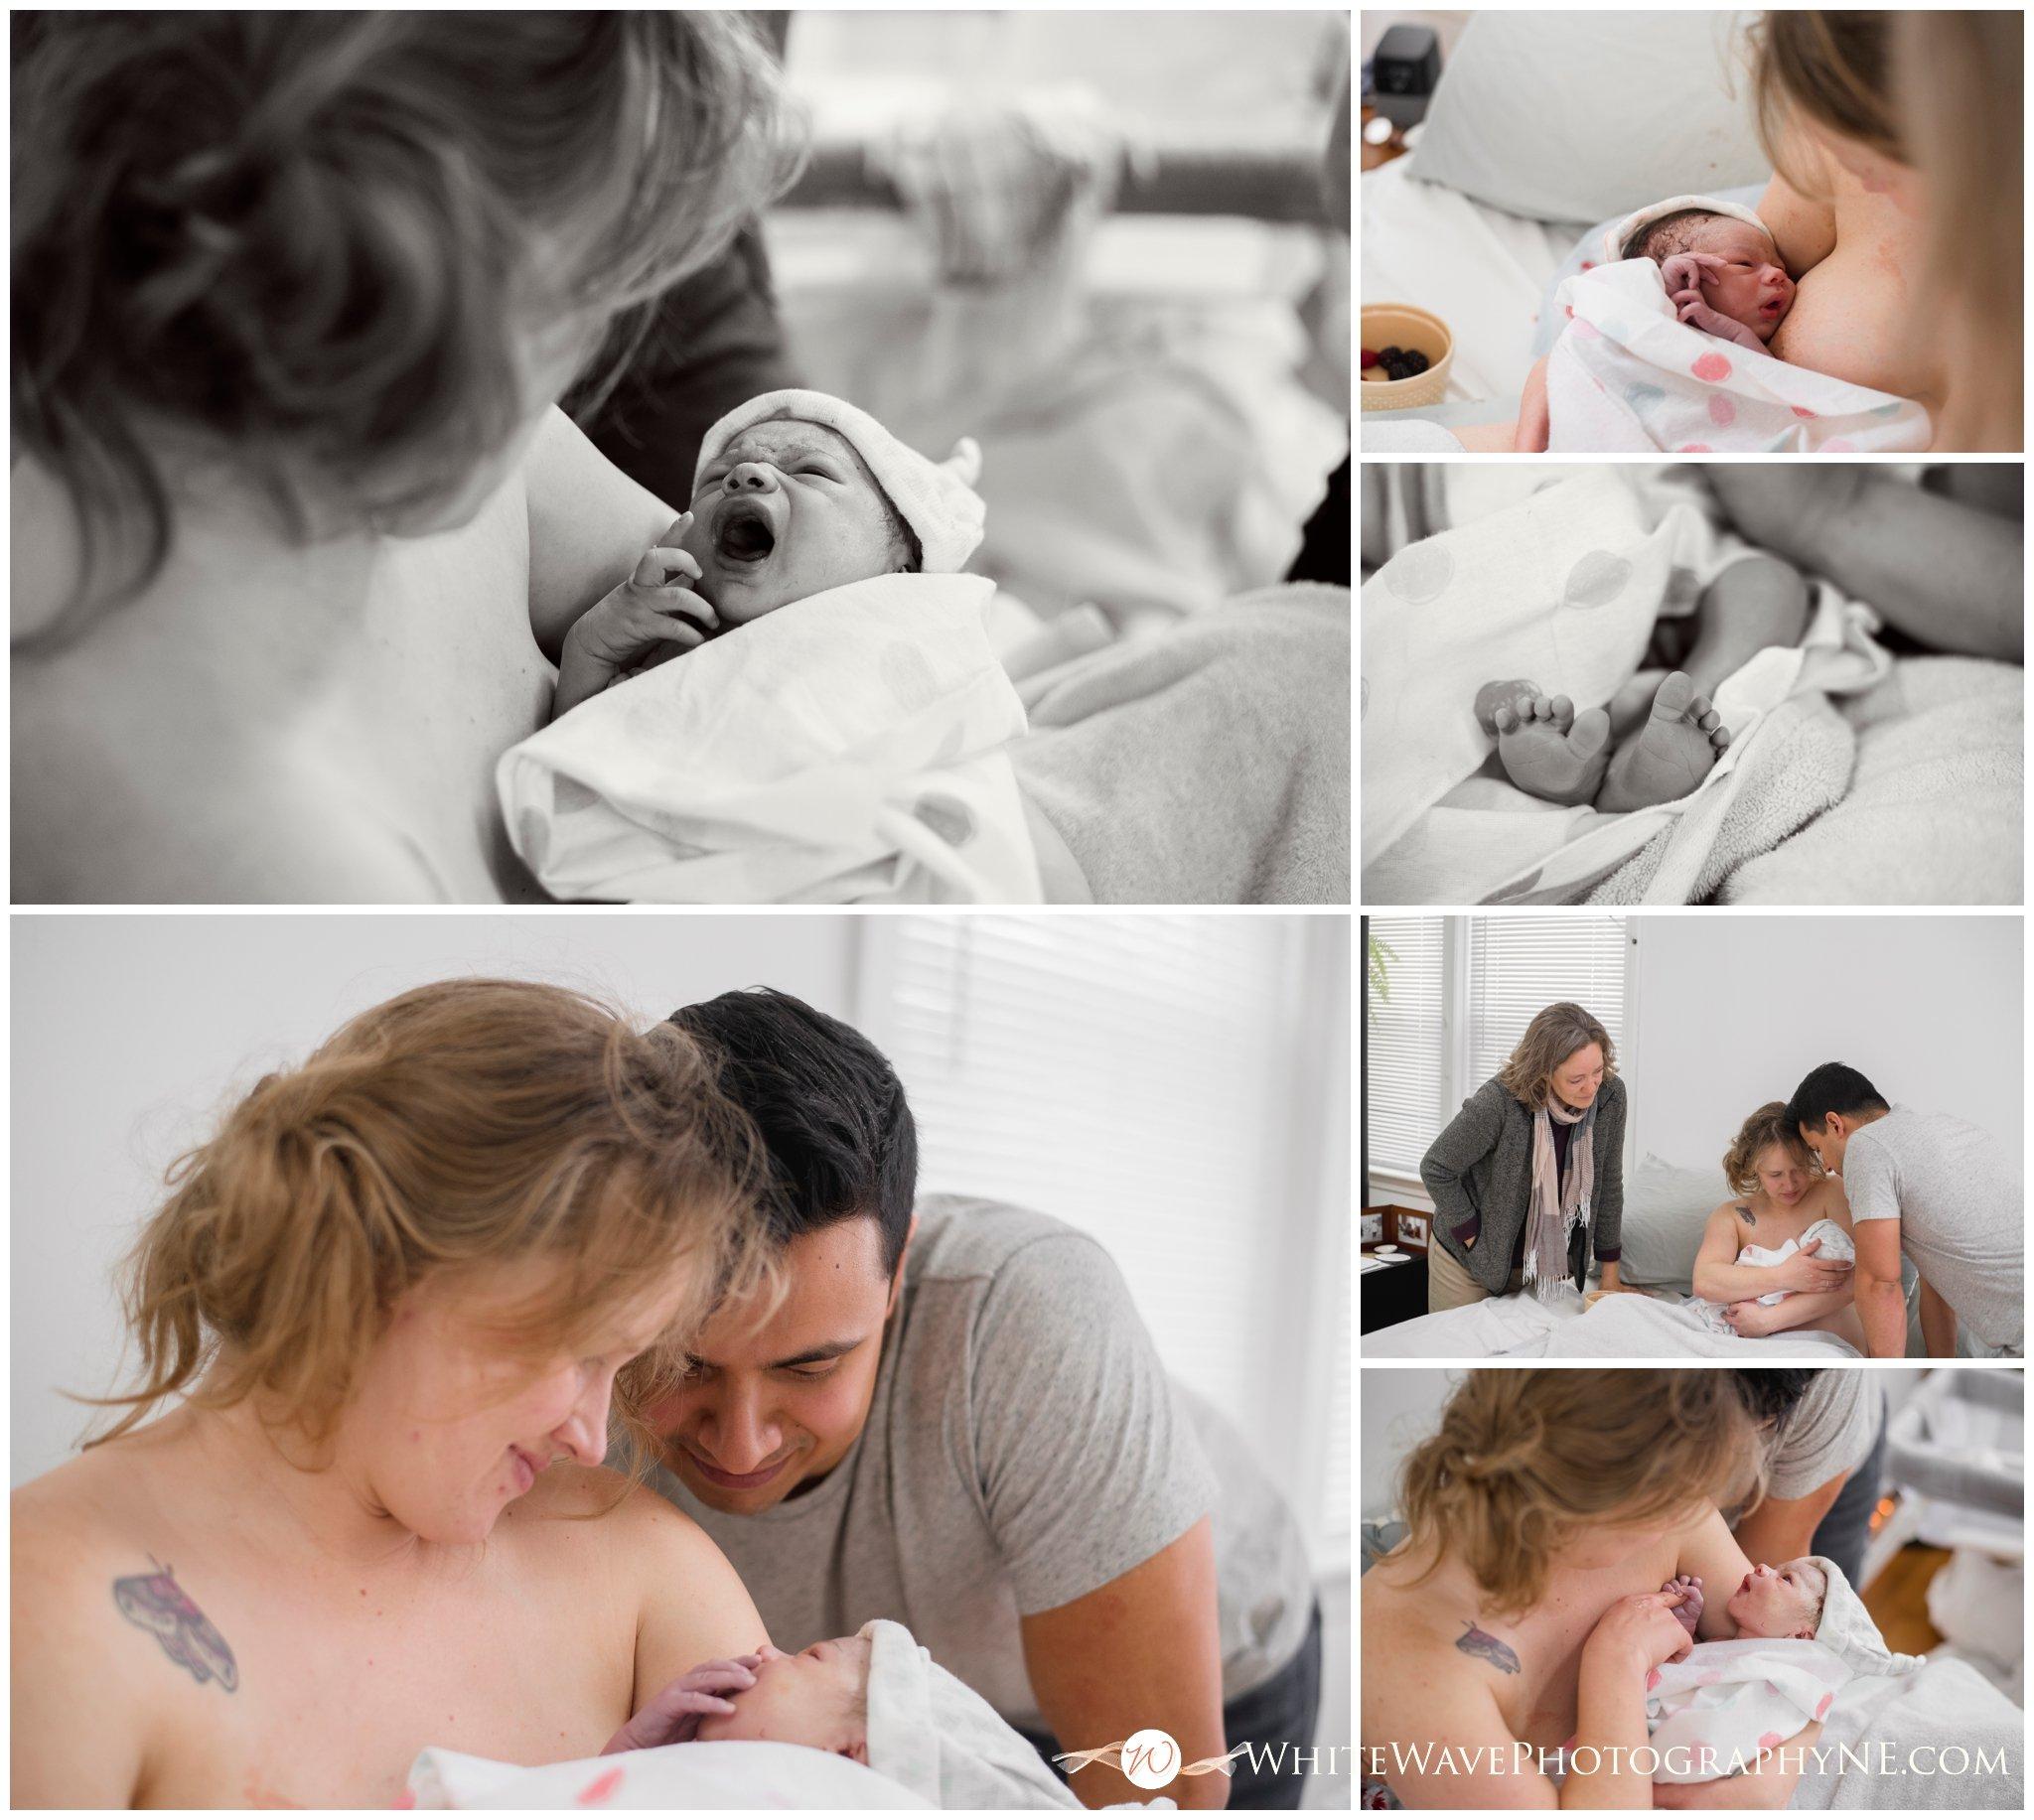 Home-Birth-NH, Birth-Photography, Birth-Photographer-NH, White-Wave-Photography